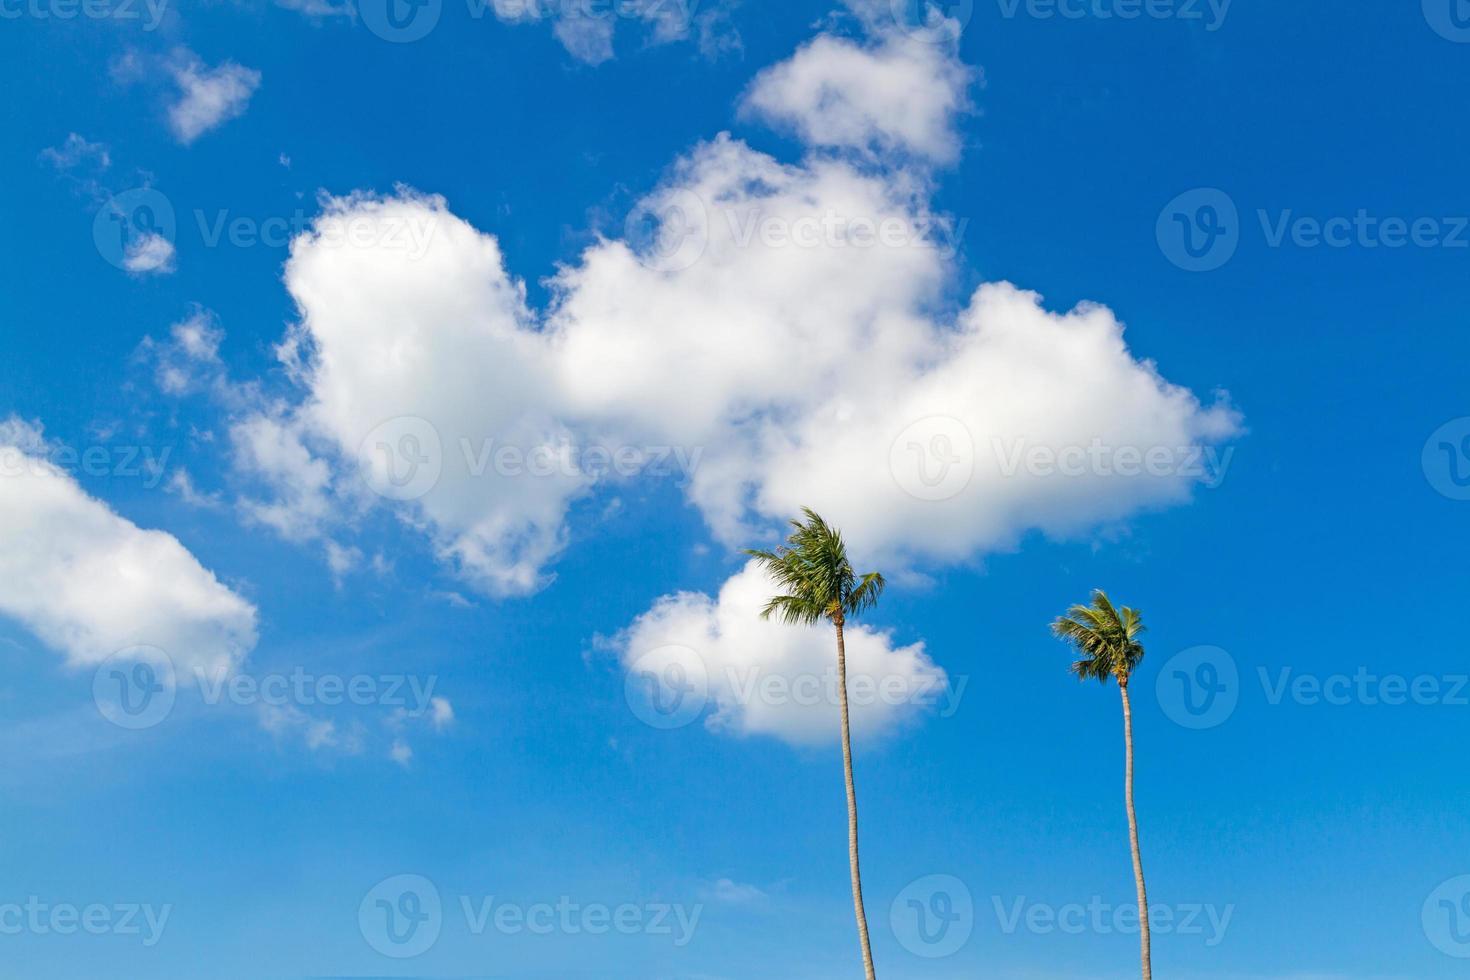 Coconut tree with blue sky photo